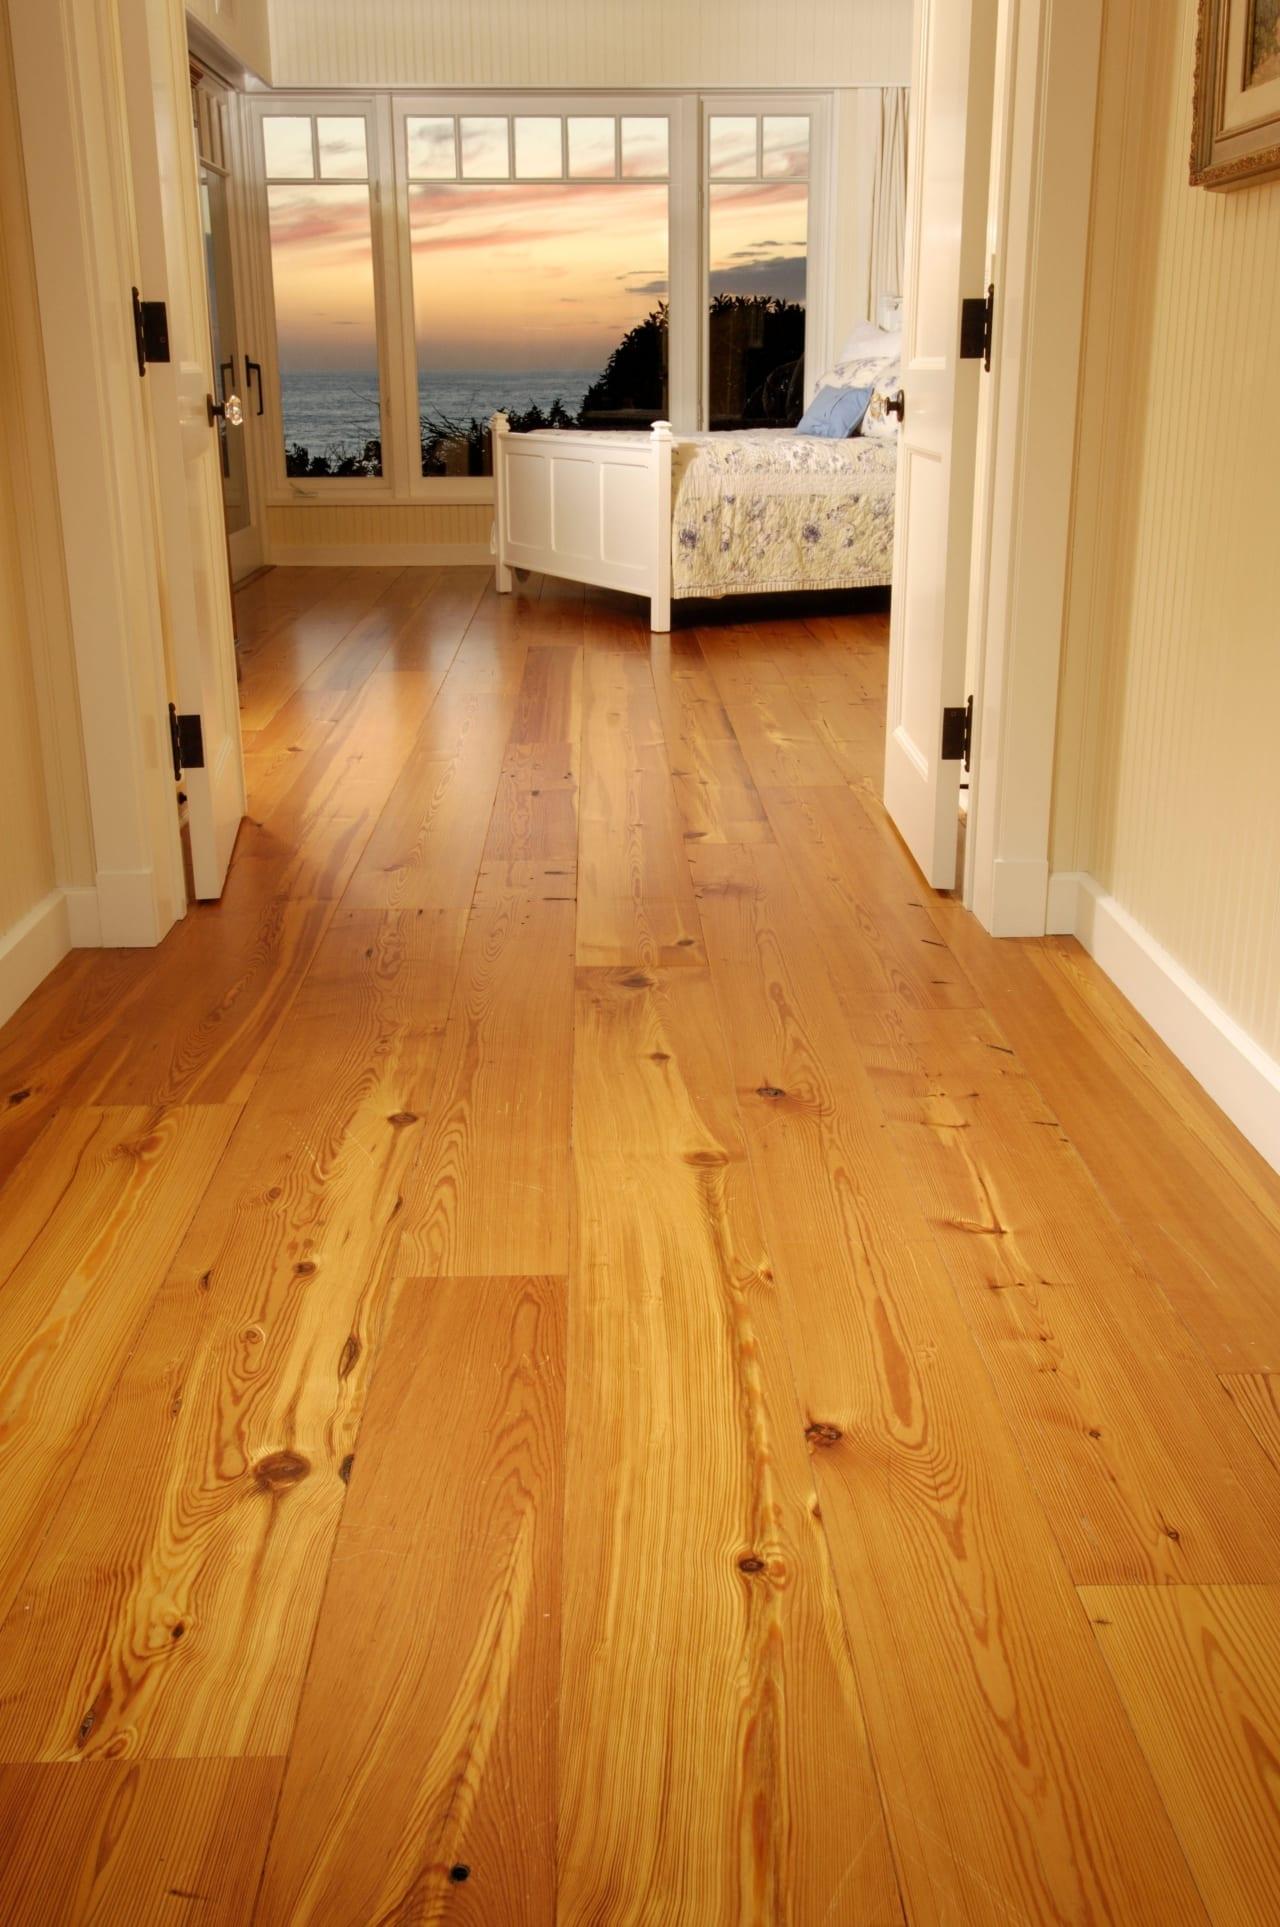 reclaimed heart pine floors in oceanfront home